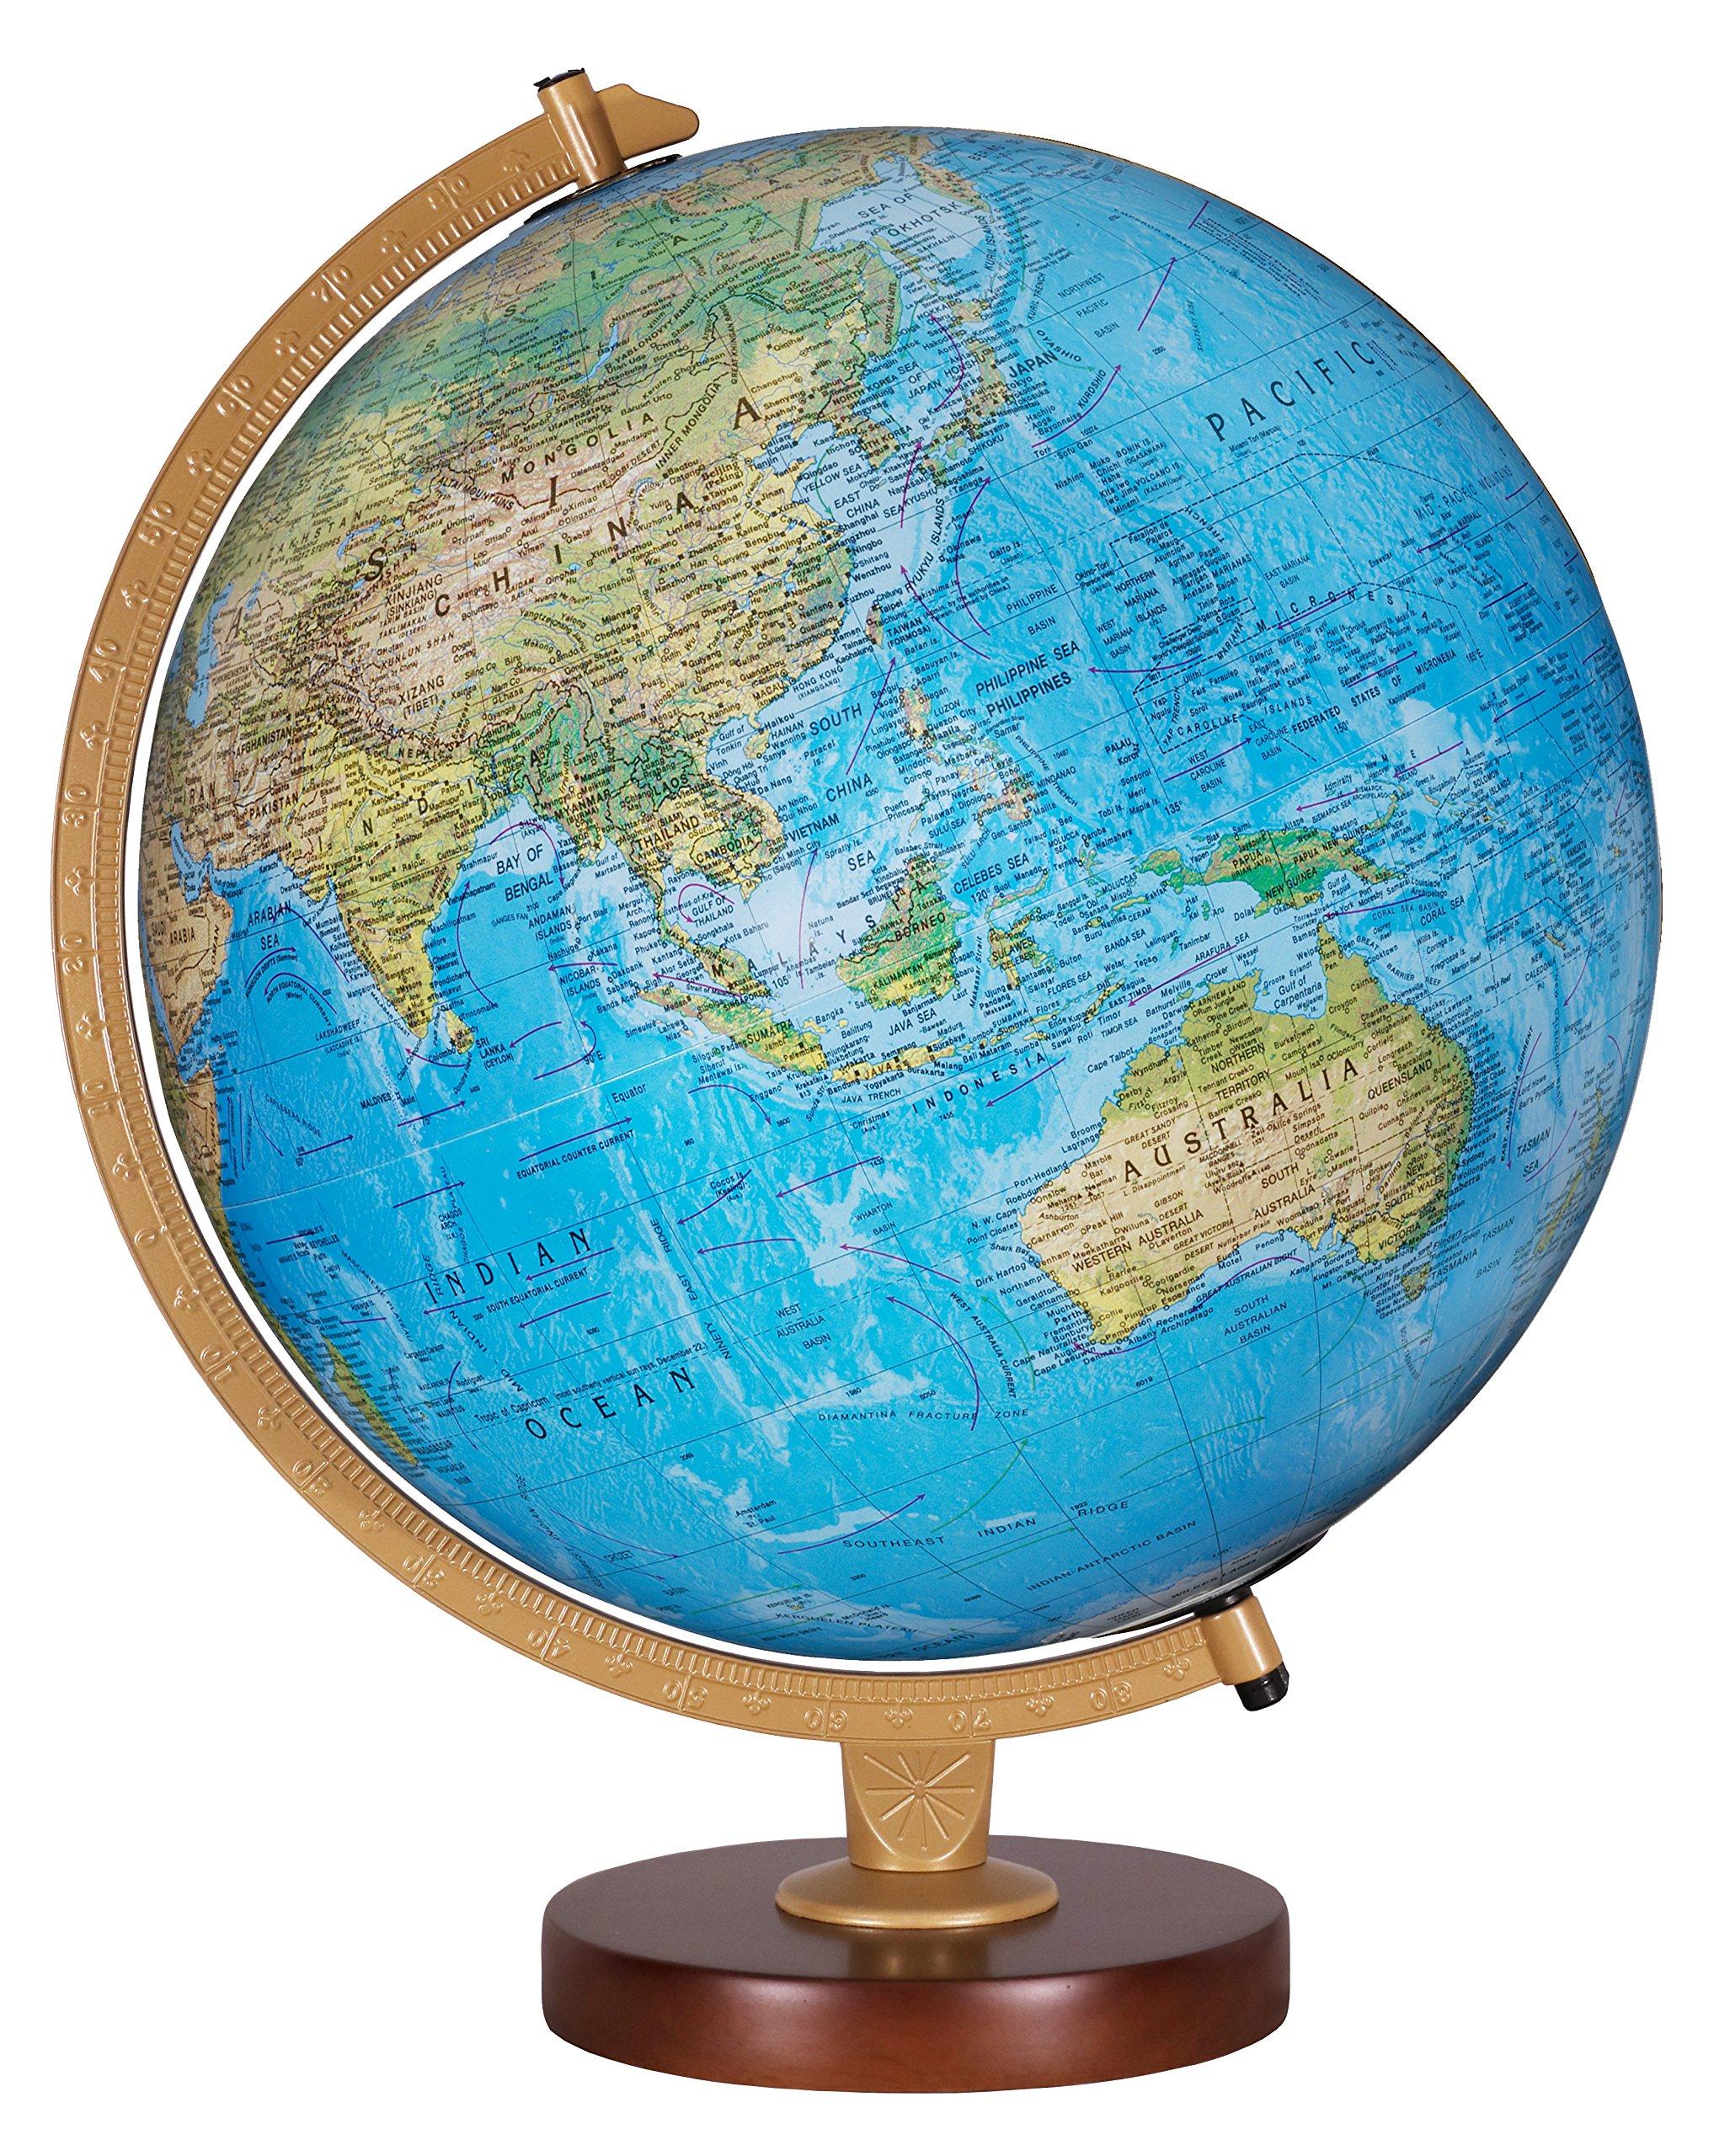 Replogle Globes Livingston Globe, 12-Inch, Blue Illume by Replogle